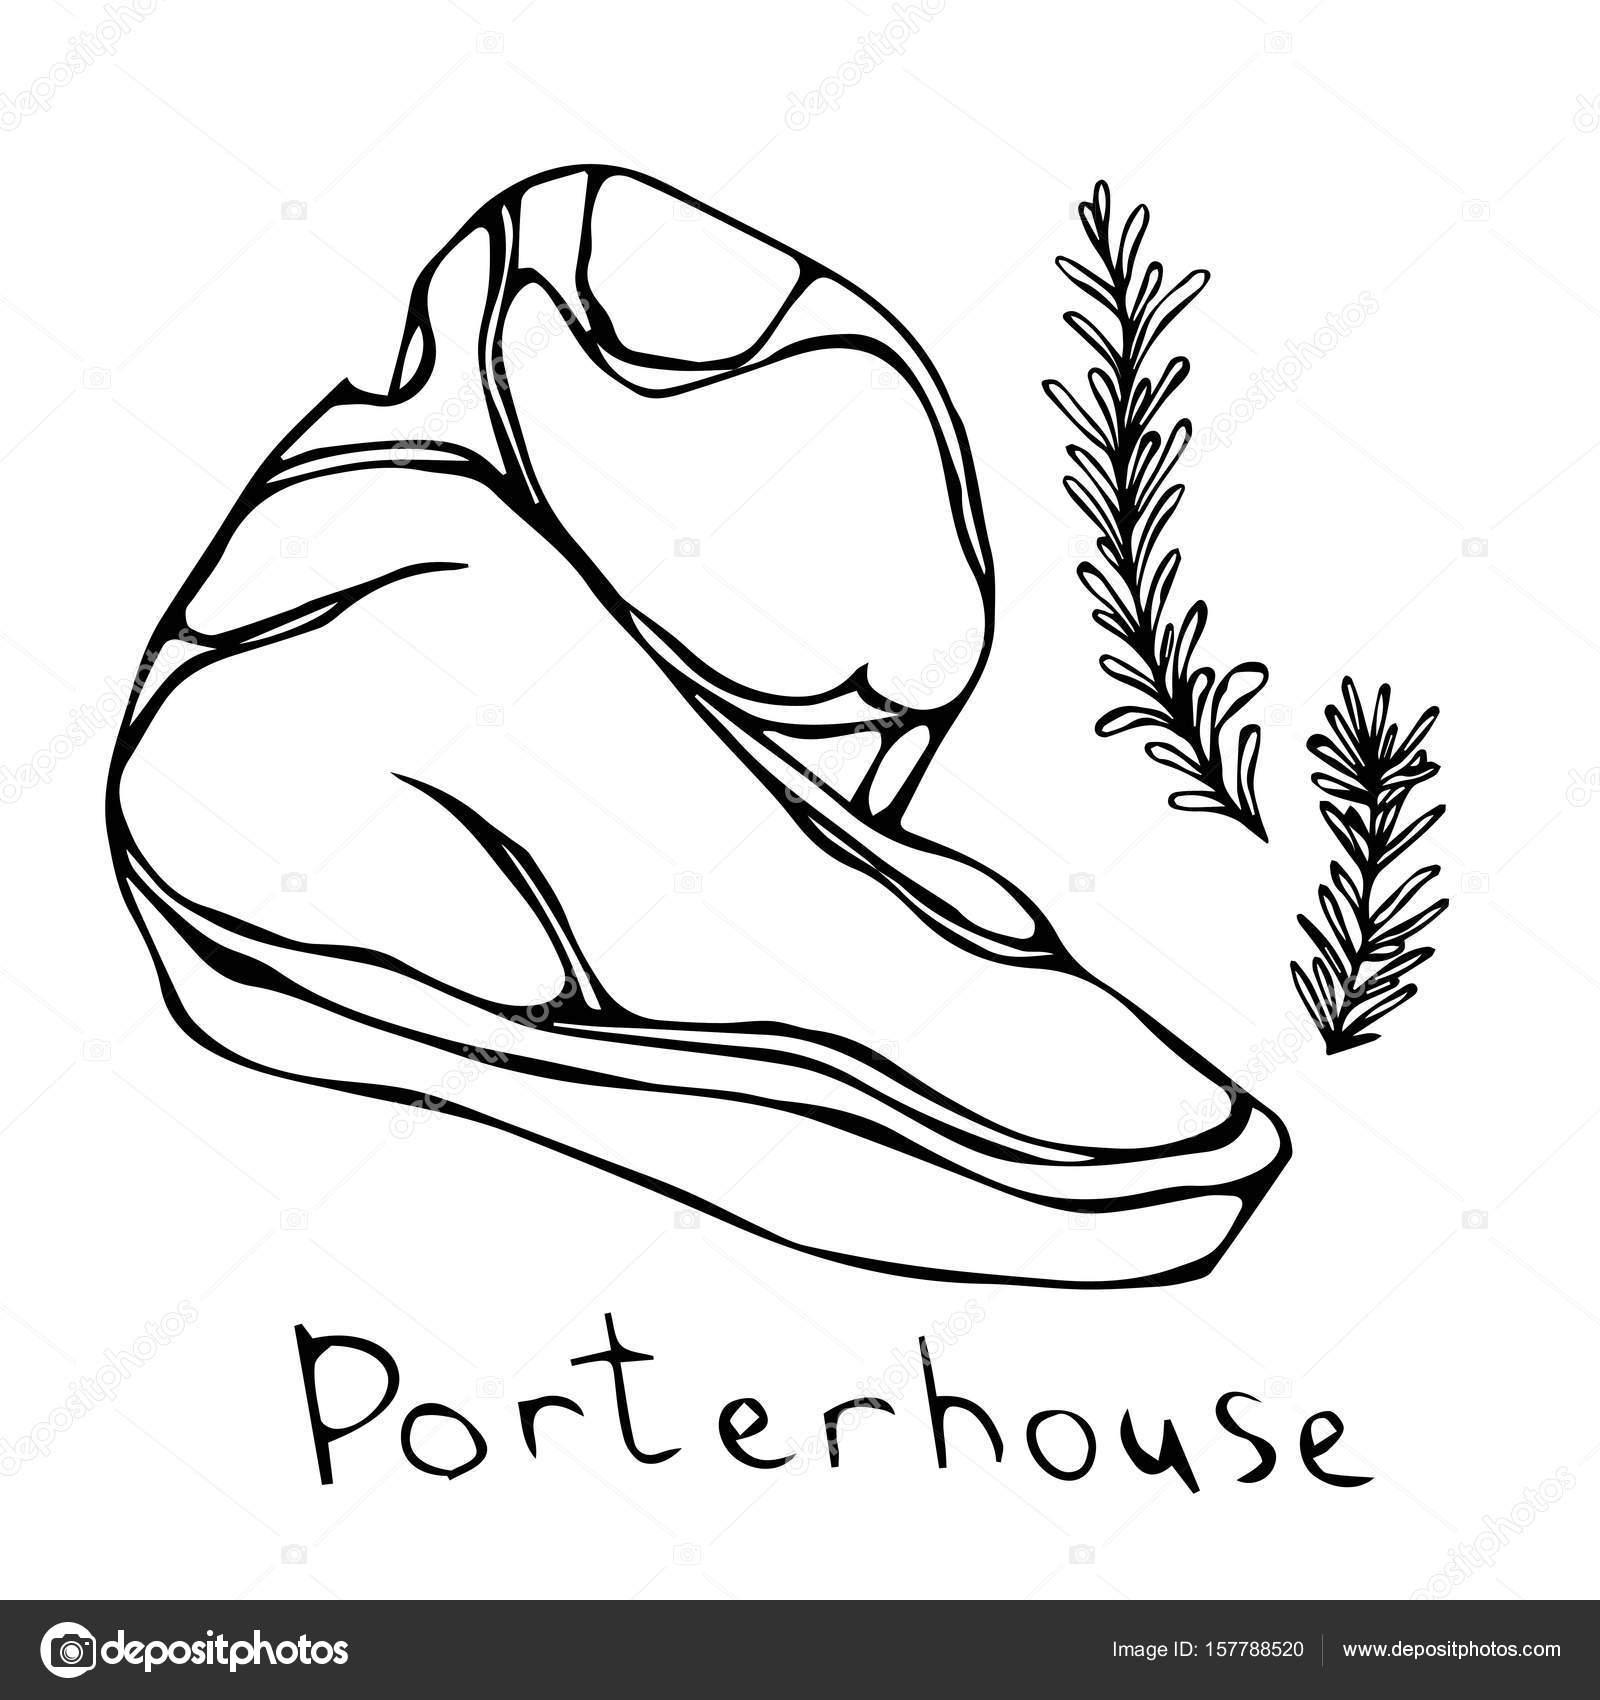 1600x1700 Porterhouse Steak Cut Vector Isolated On White Background. Outline